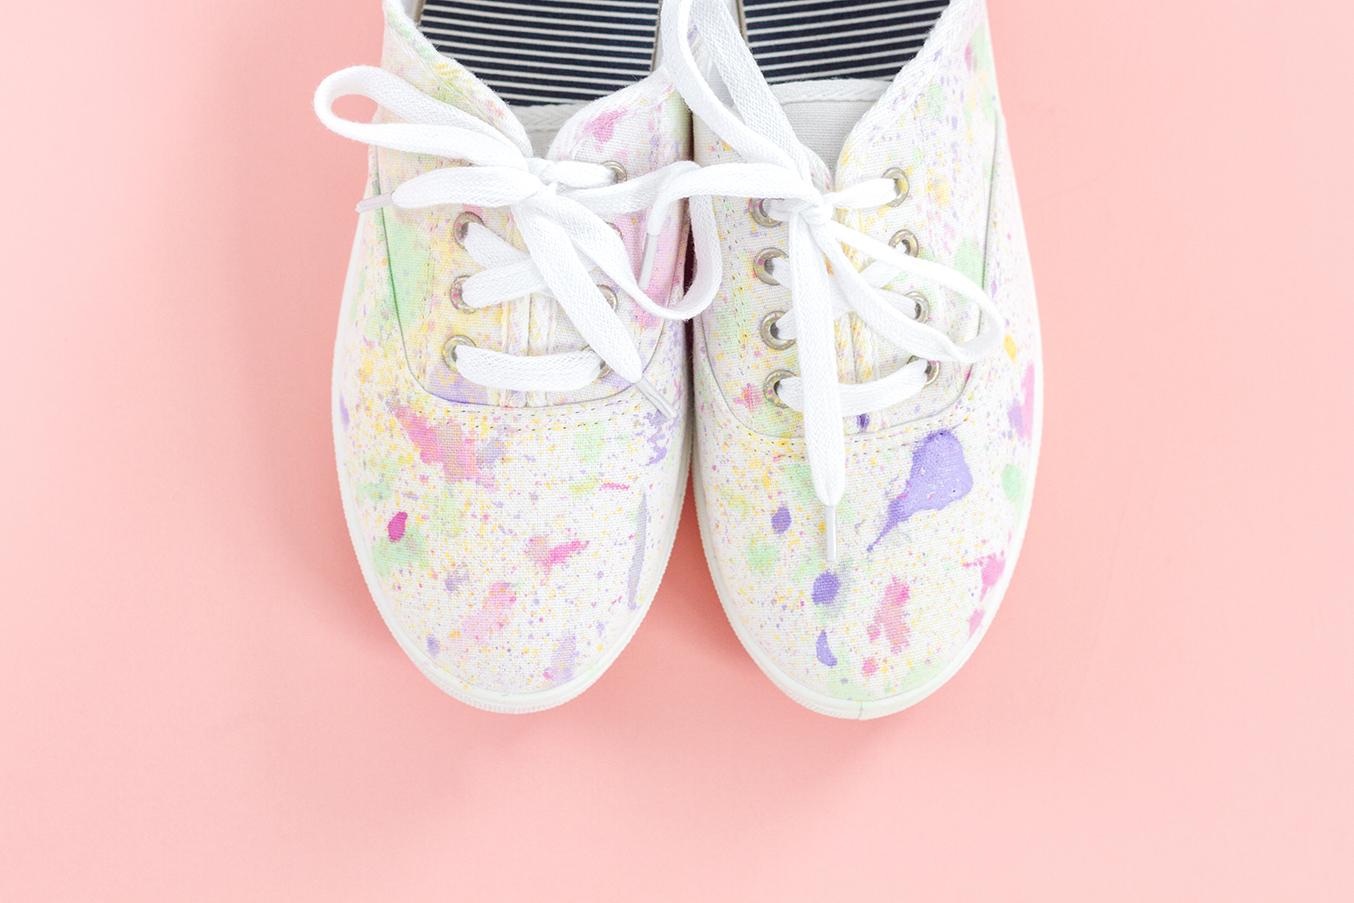 Diy Abstract Paint Splatter Shoes Dream Green Diy